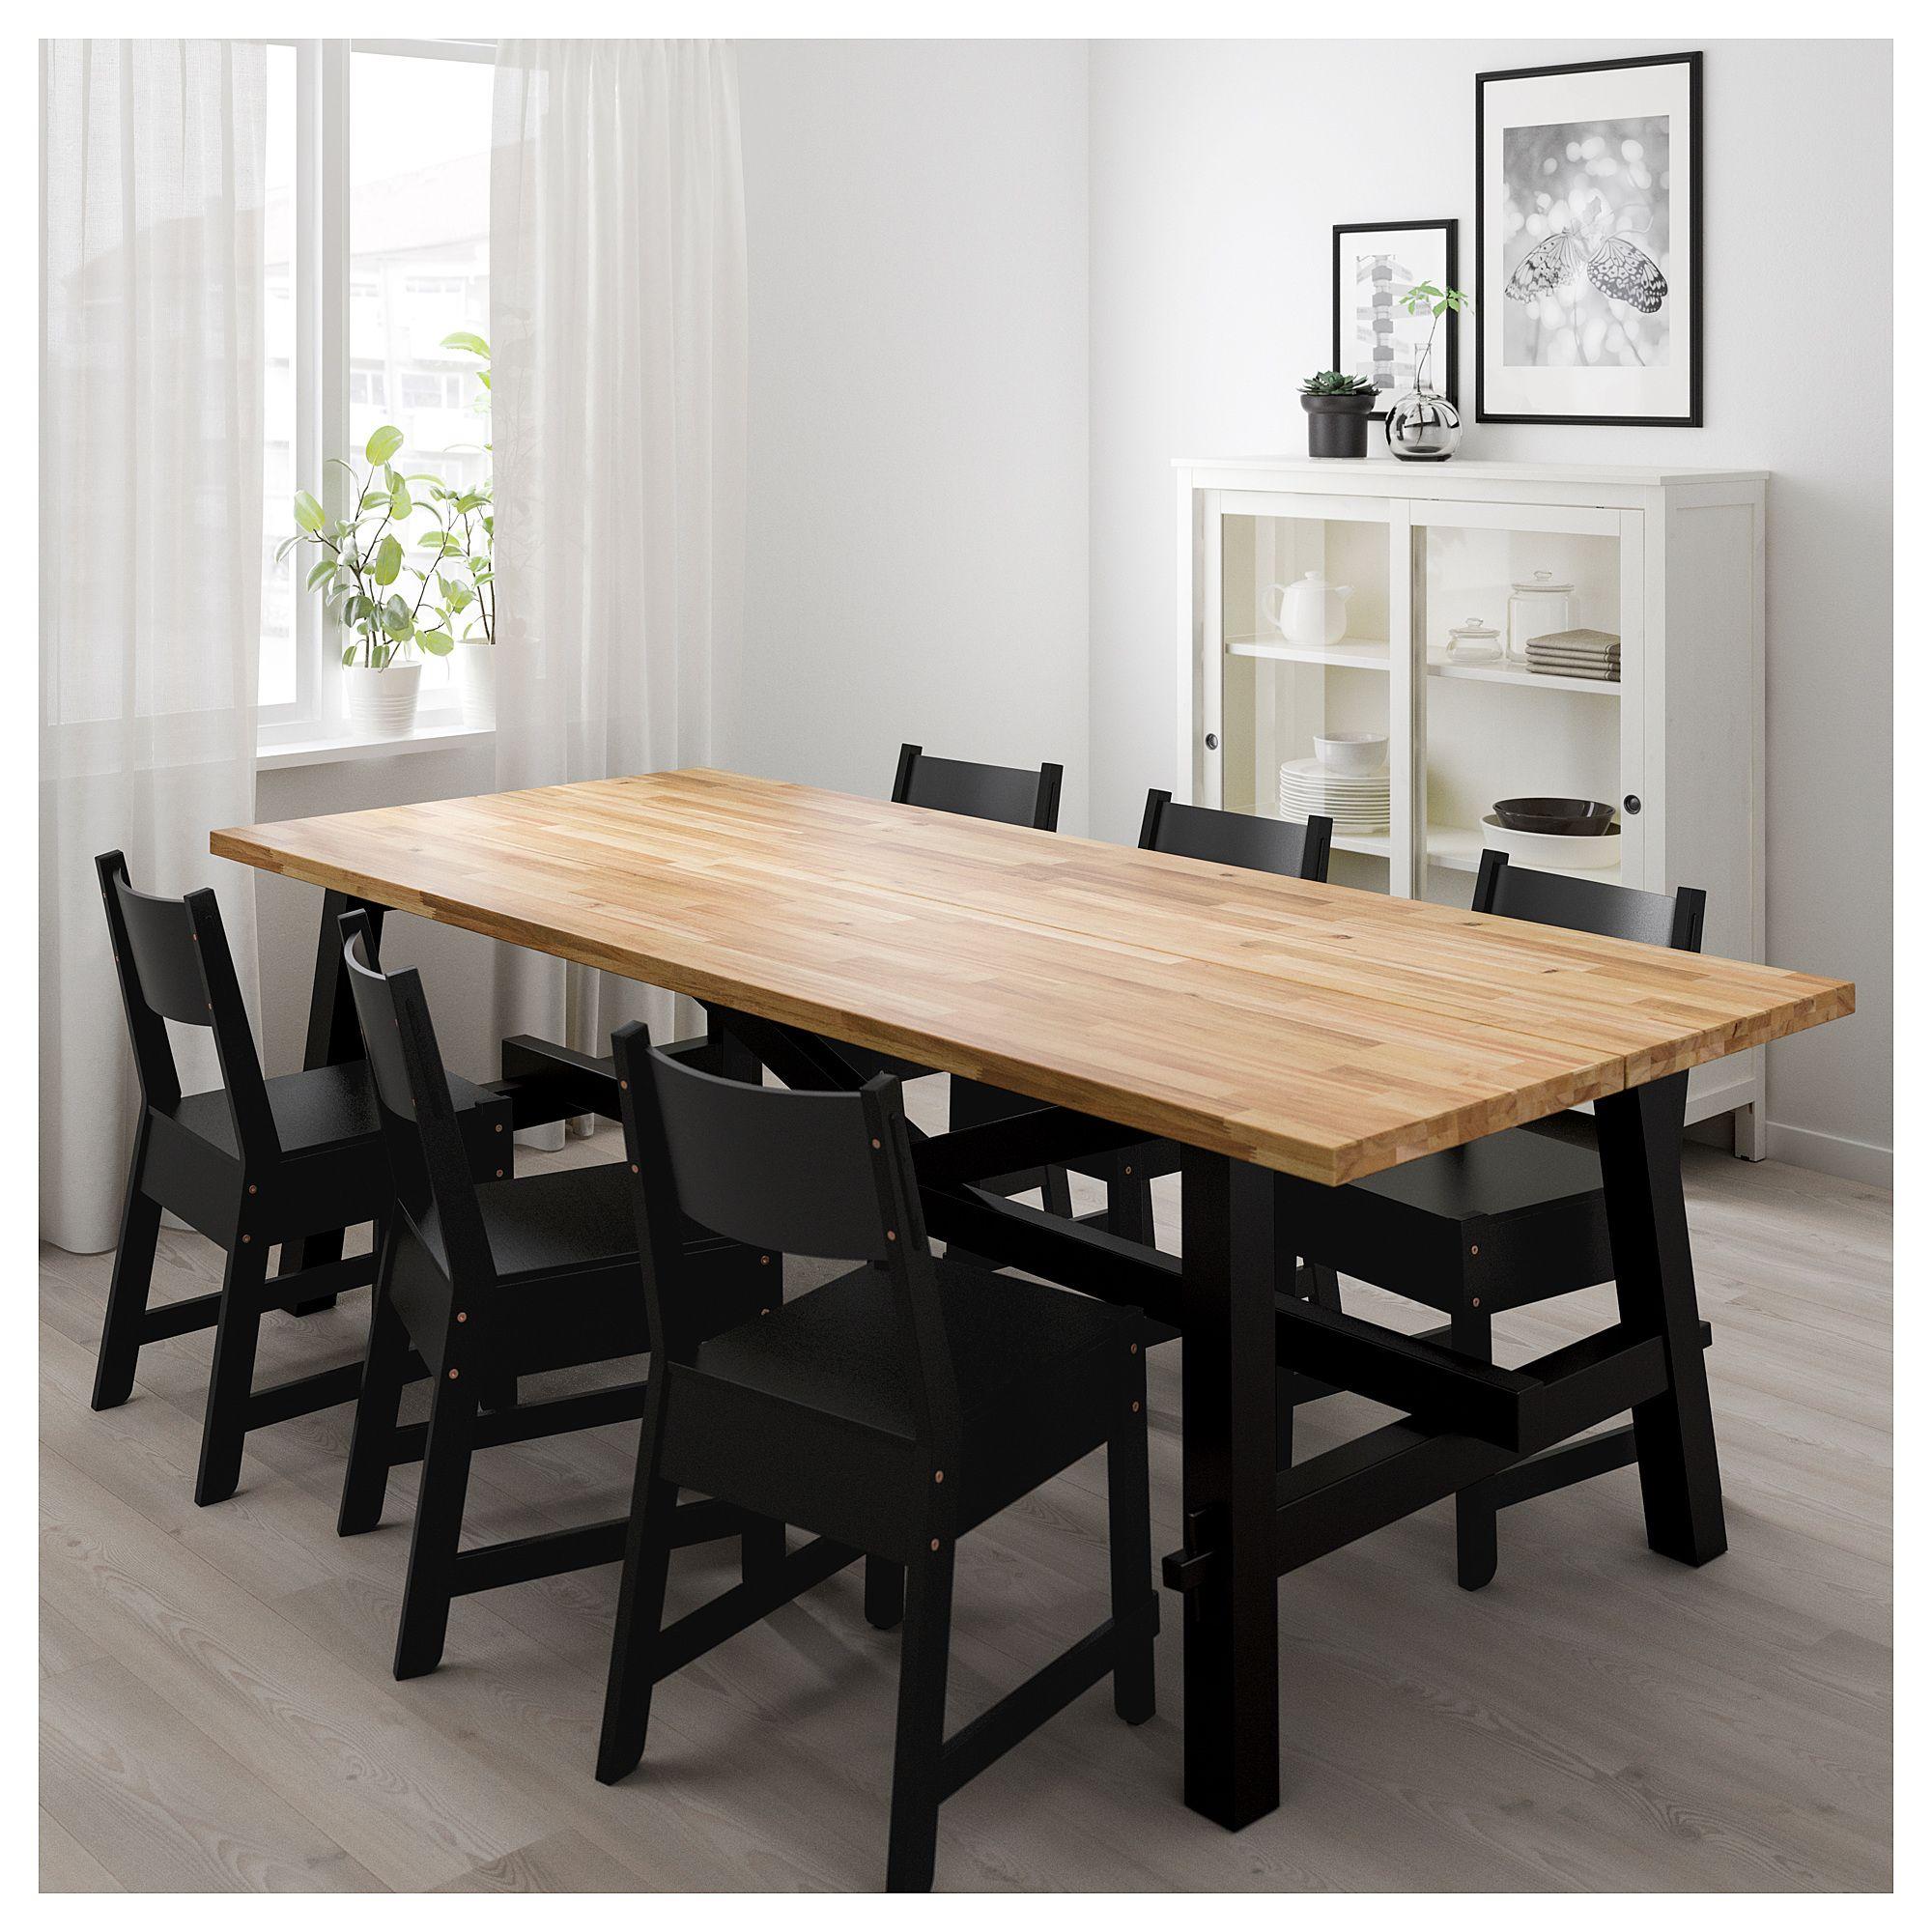 Furniture and Home Furnishings Ikea dining table, Ikea